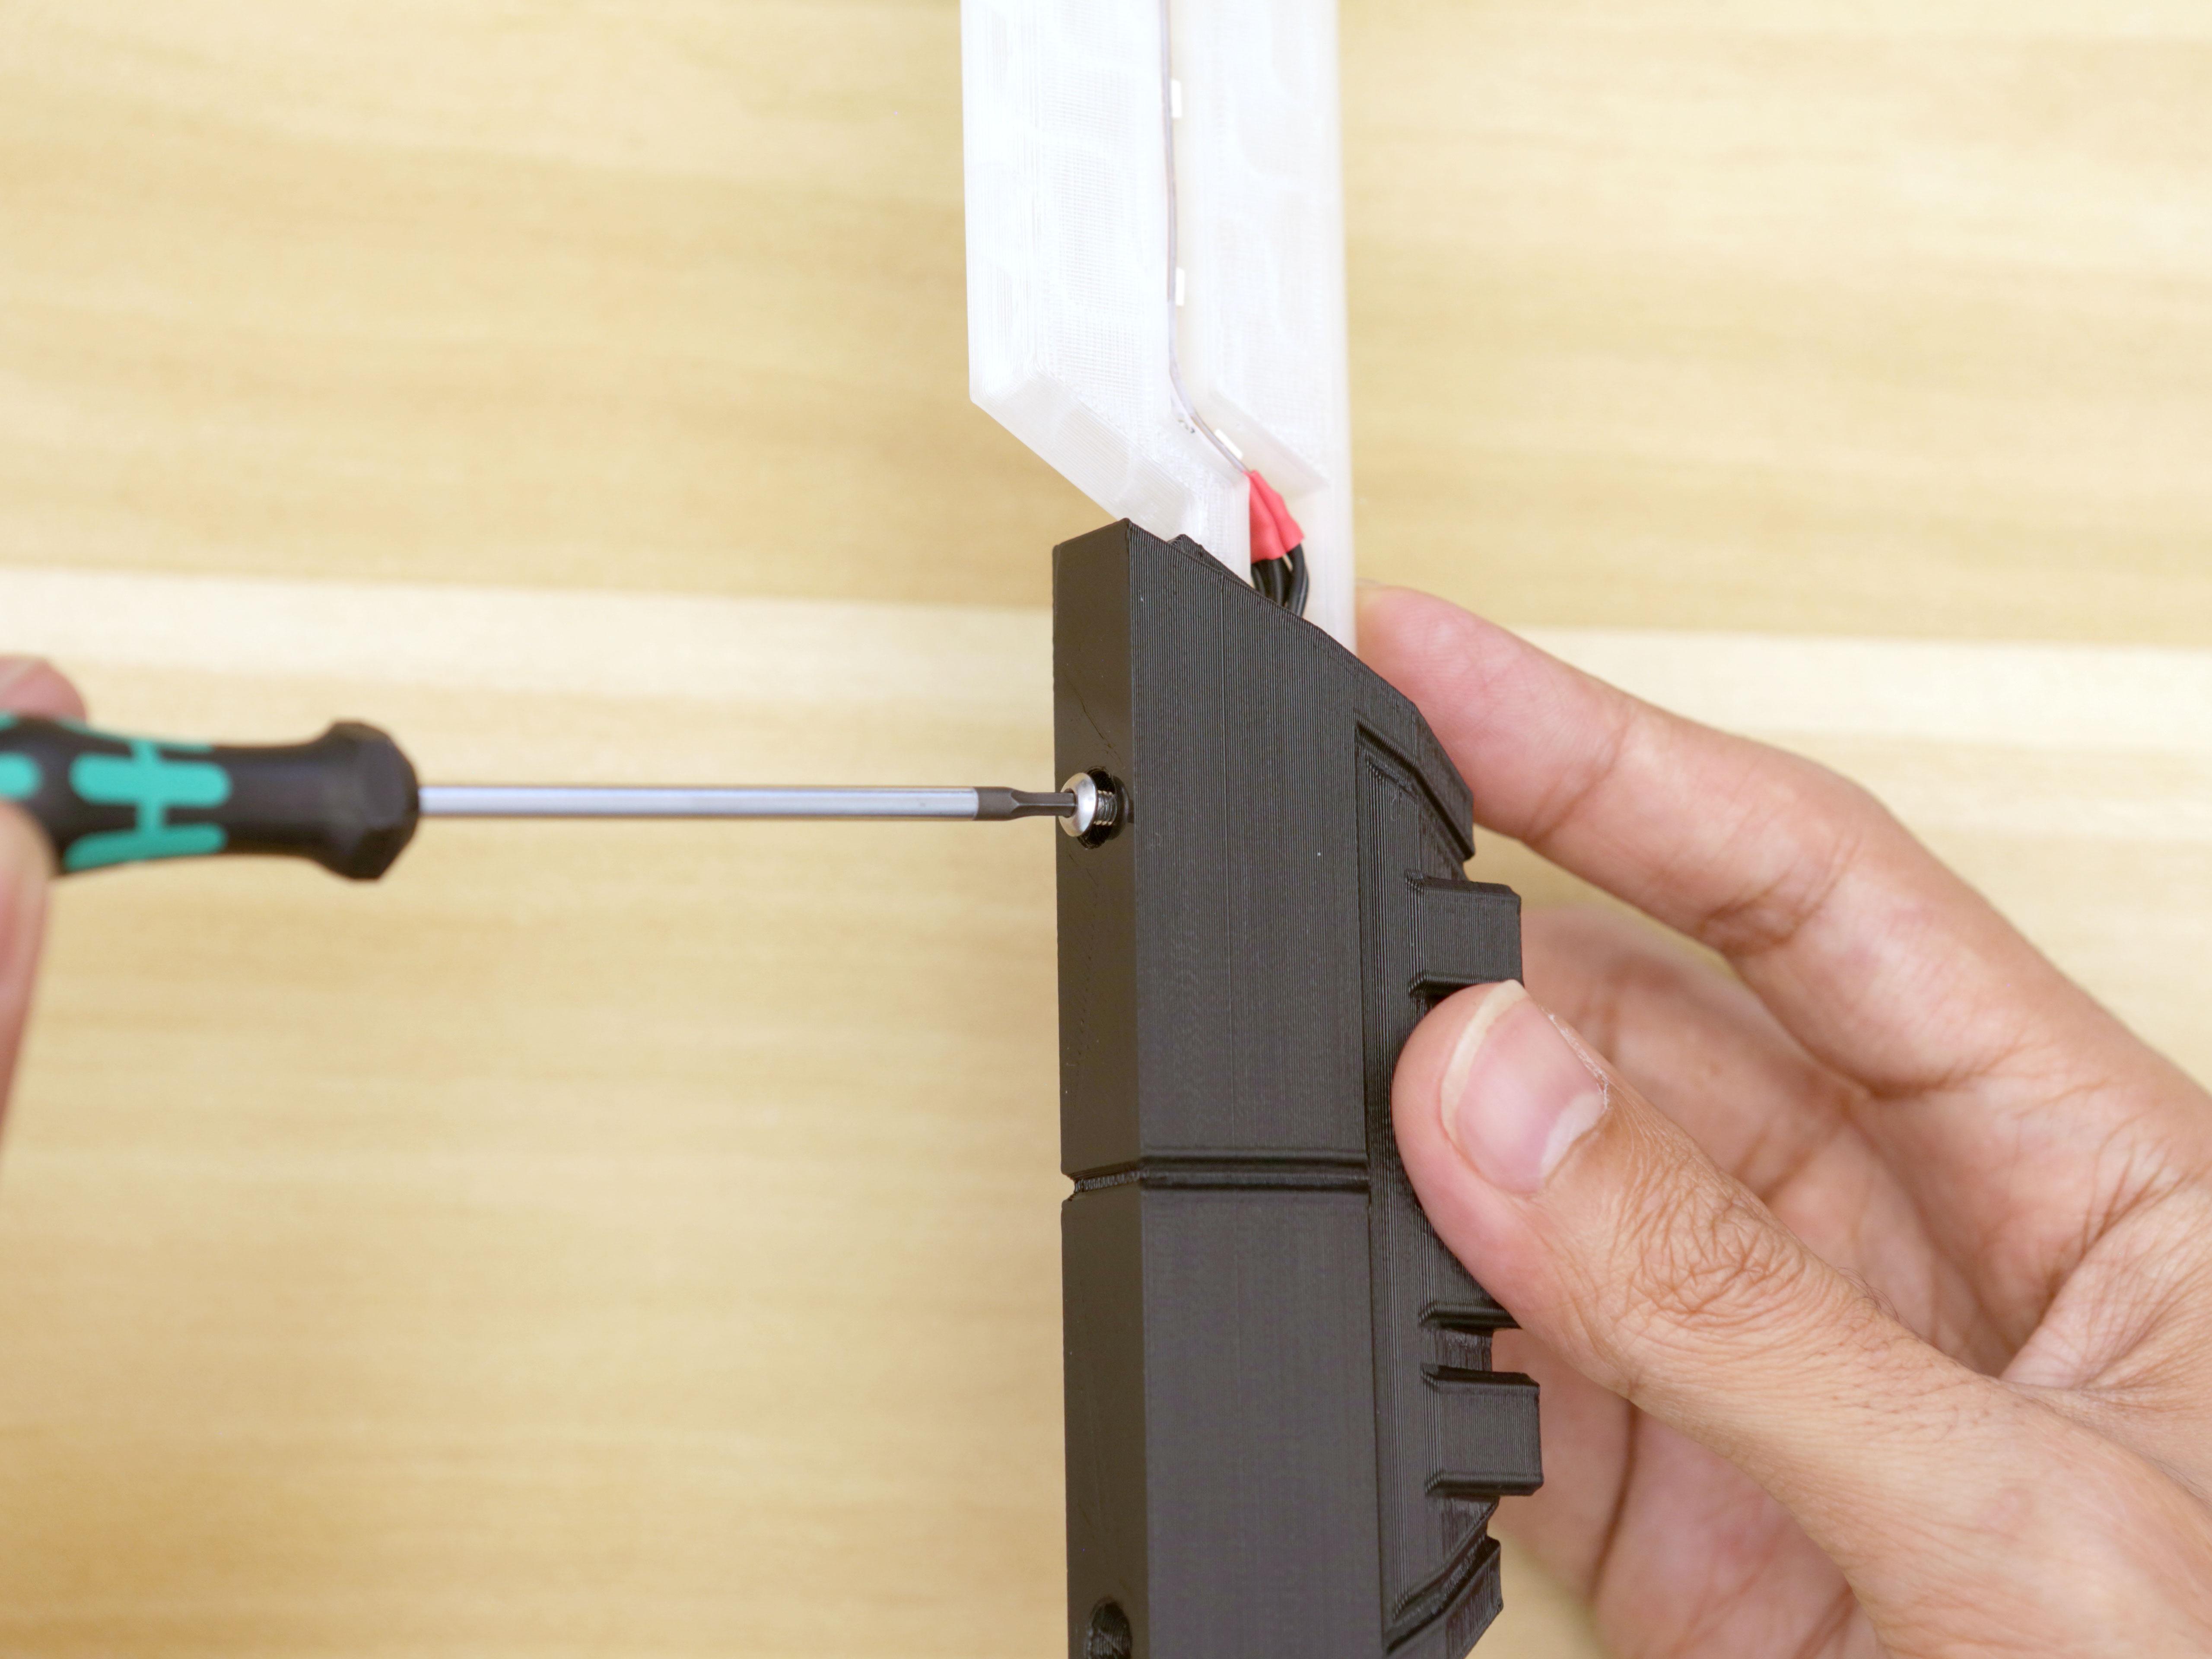 3d_printing_blade-emitter-screw.jpg